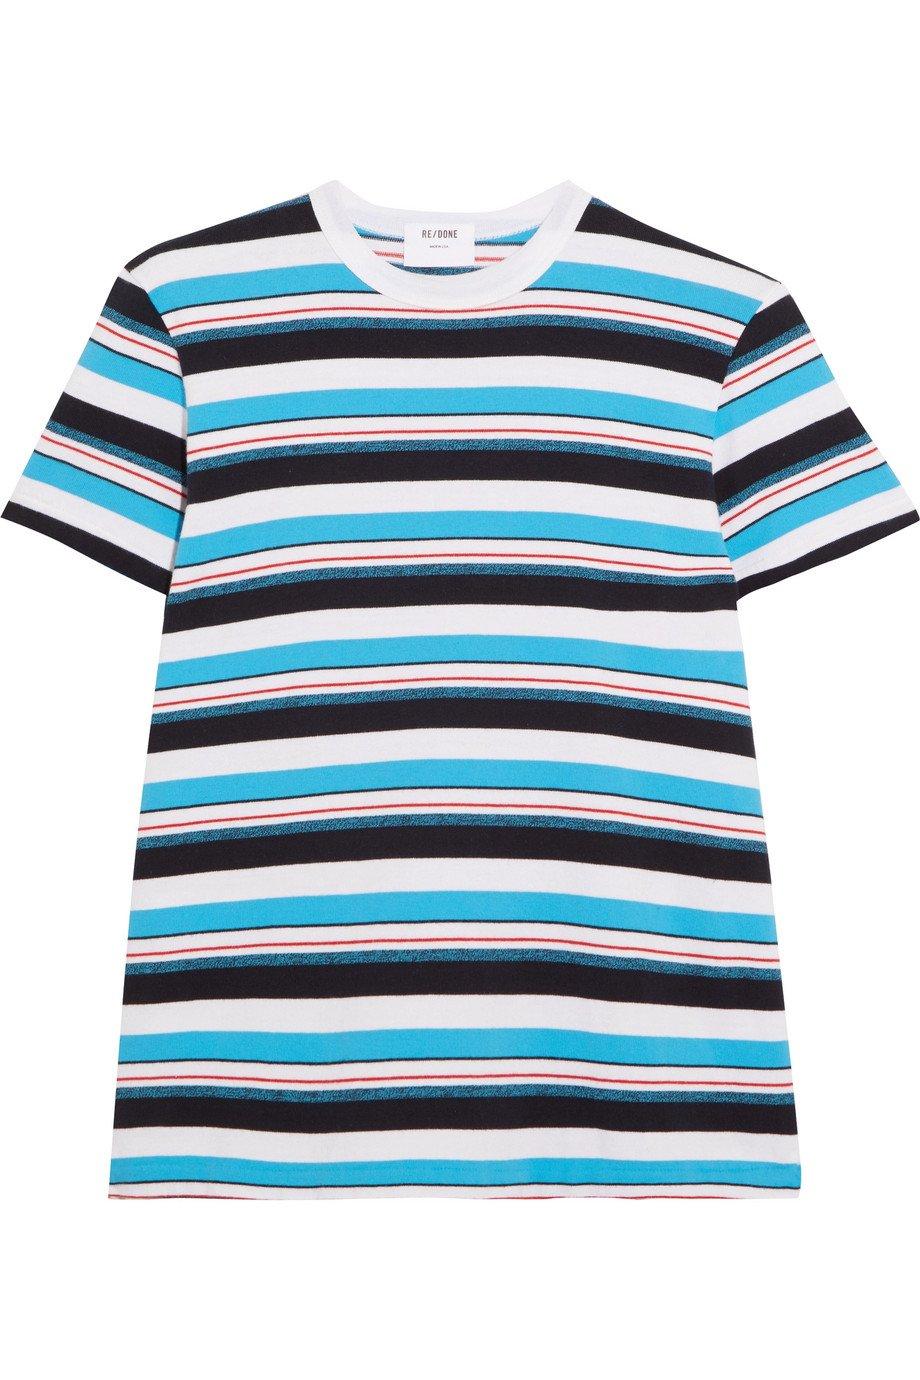 RE/DONE   Striped cotton-jersey T-shirt   NET-A-PORTER.COM